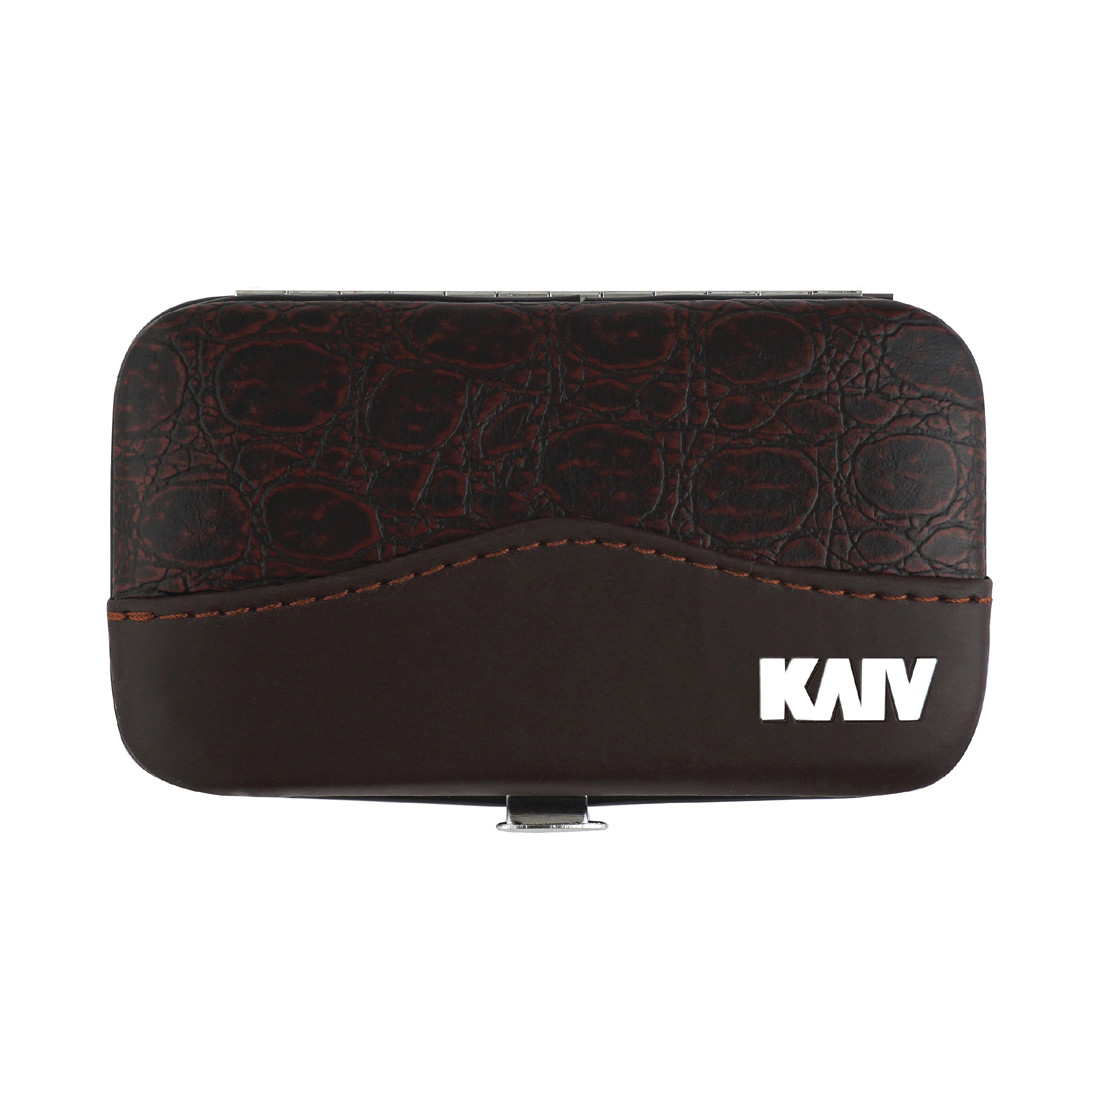 KAIV Manicure Set of 7